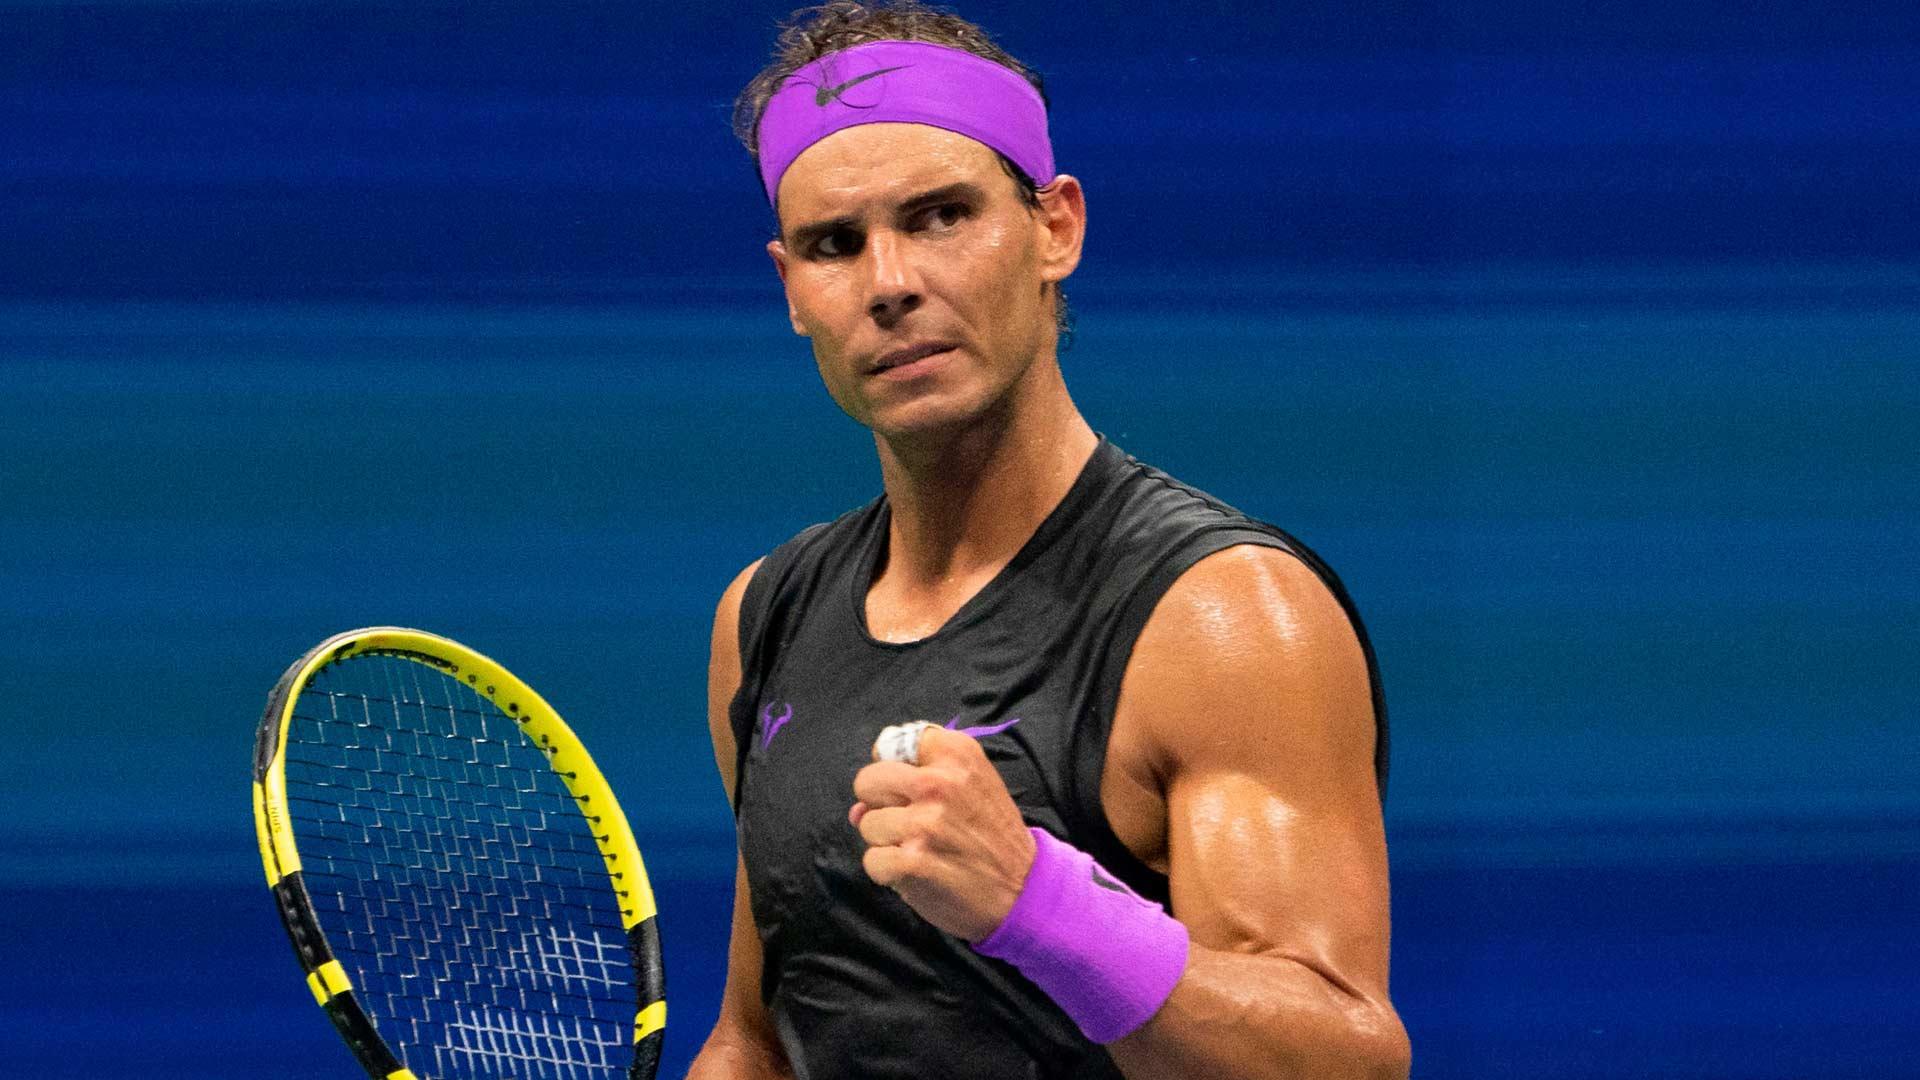 Rafael Nadal, Diego Schwartzman, US Open, Tennis, NewsMobile, Mobile, News, India